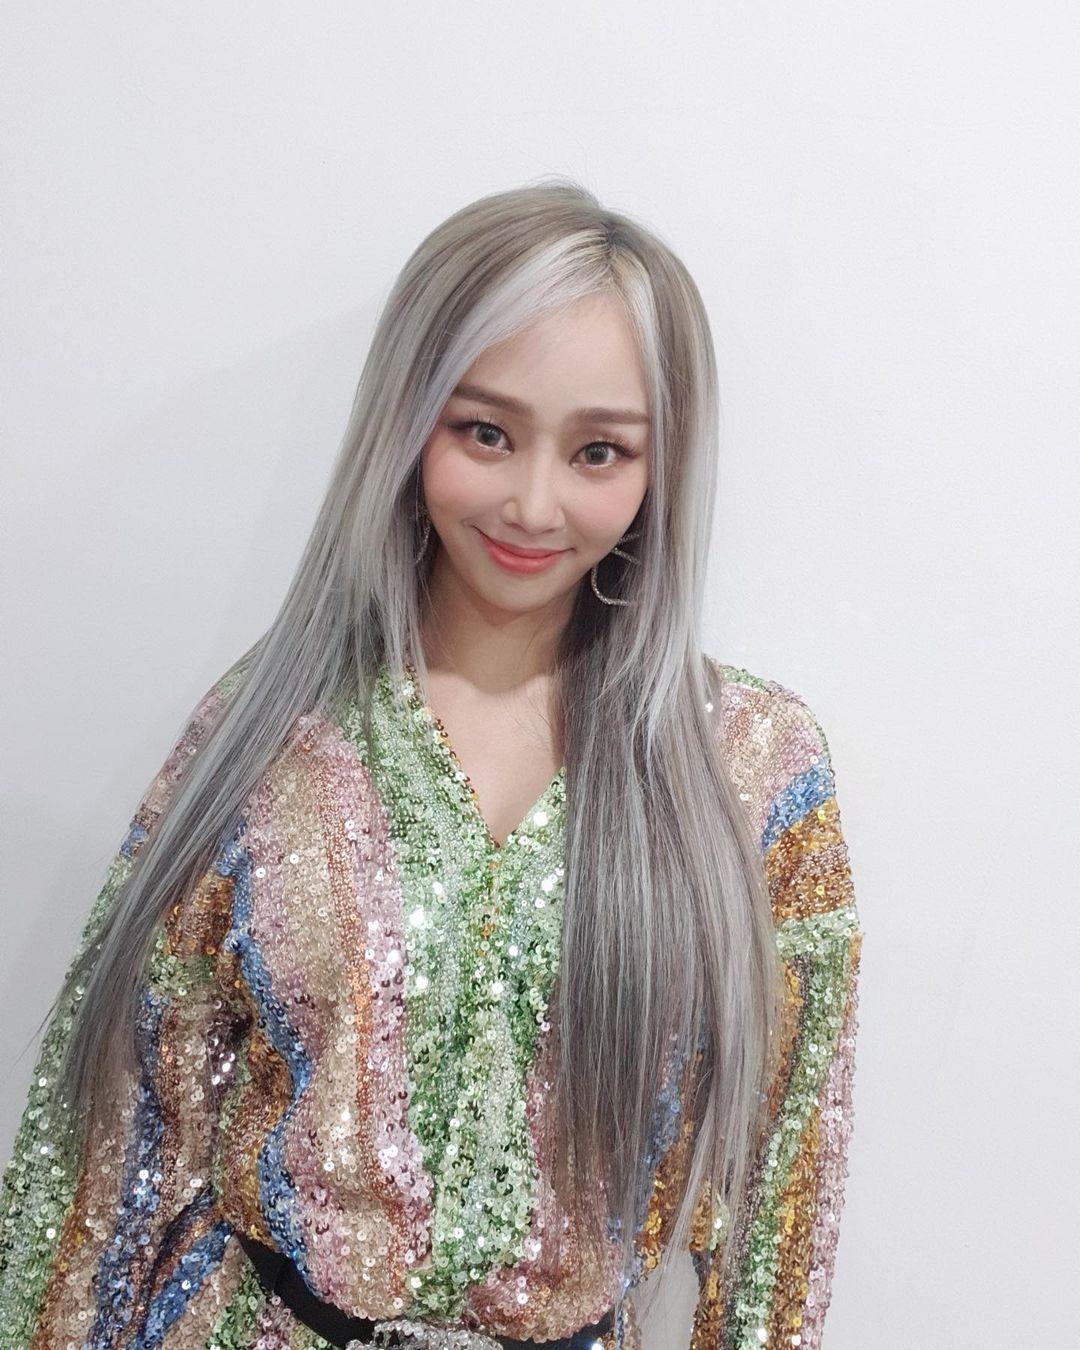 K-pop idols who established their own entertainment companies: Hyolyn